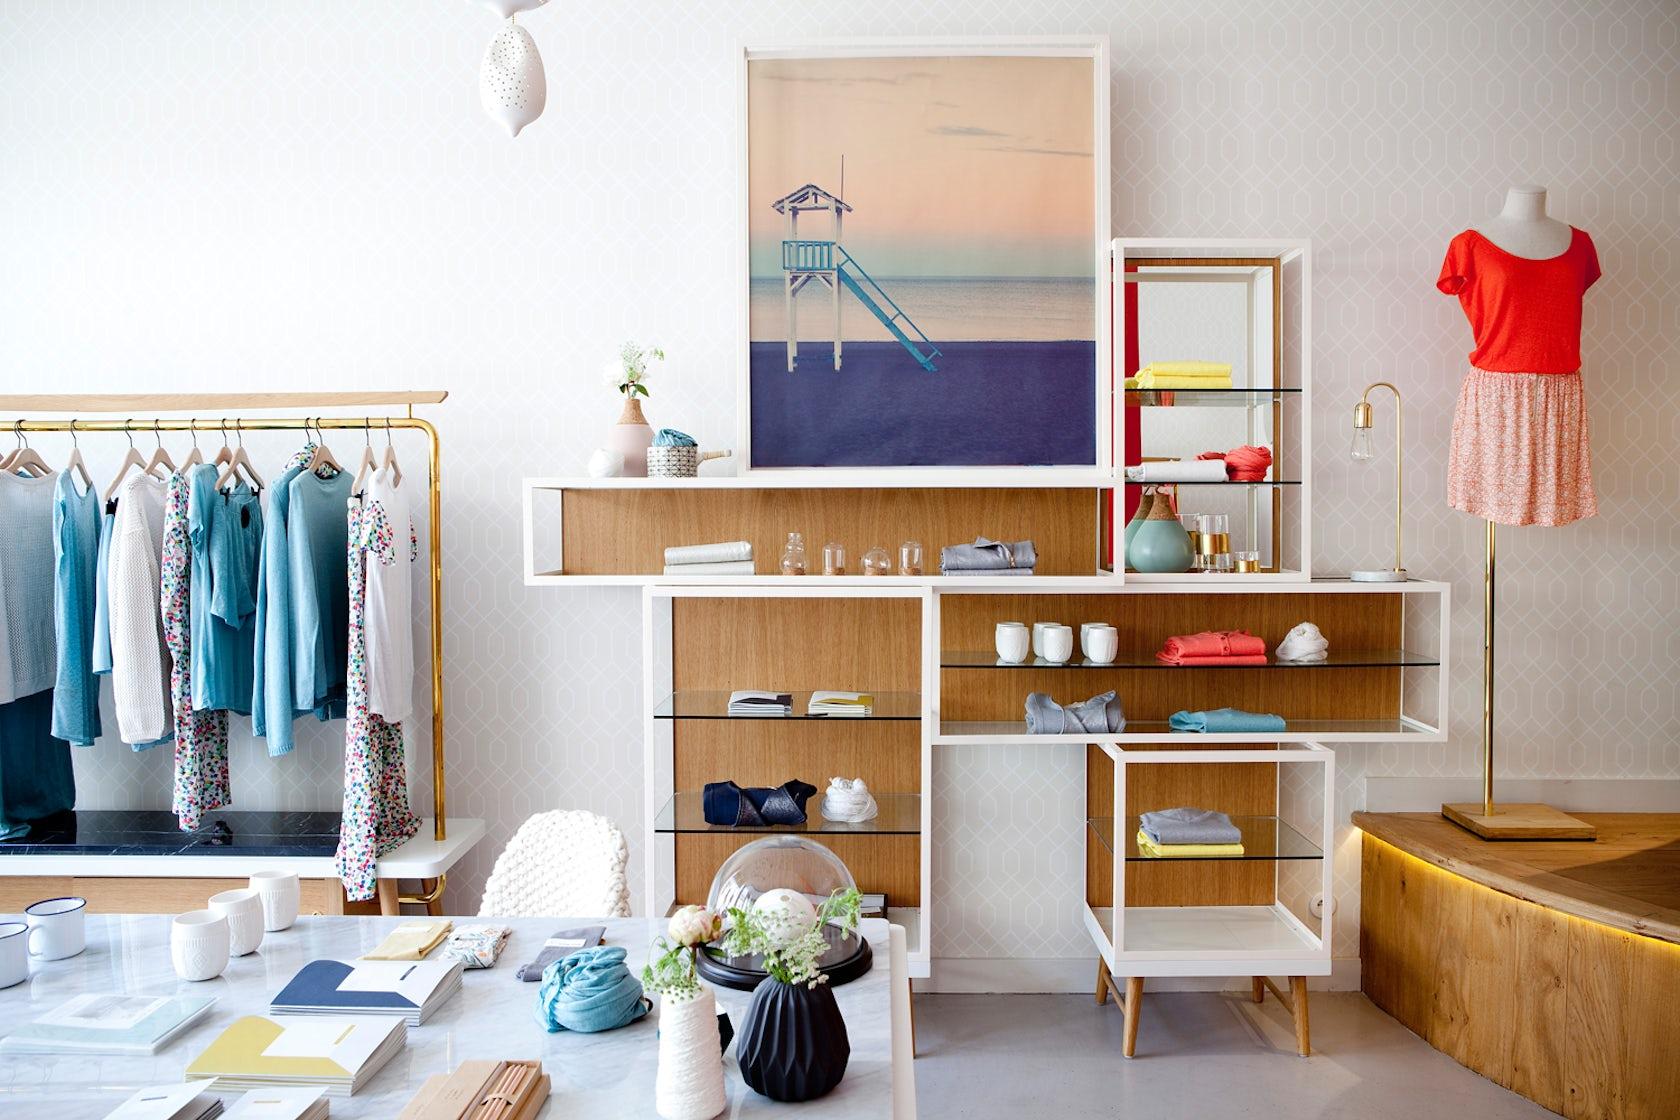 marie sixtine store design visual merchandising. Black Bedroom Furniture Sets. Home Design Ideas